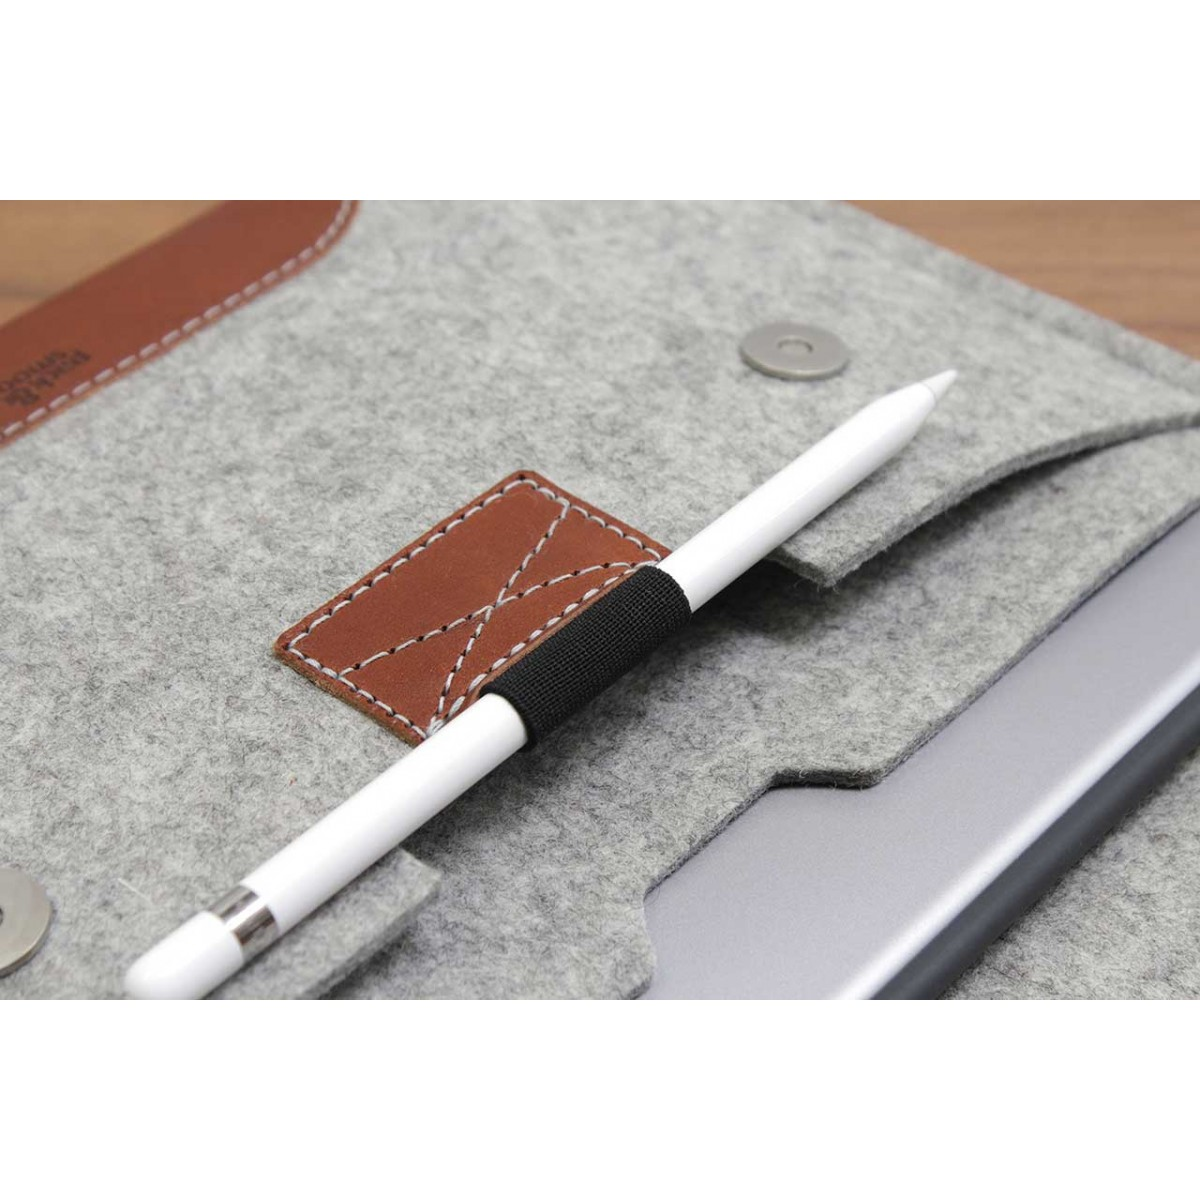 "iPad Pro 11"" Hülle, Case ""Hampshire"" 100% Merino Wollfilz, Pflanzlich gegerbtes Leder"